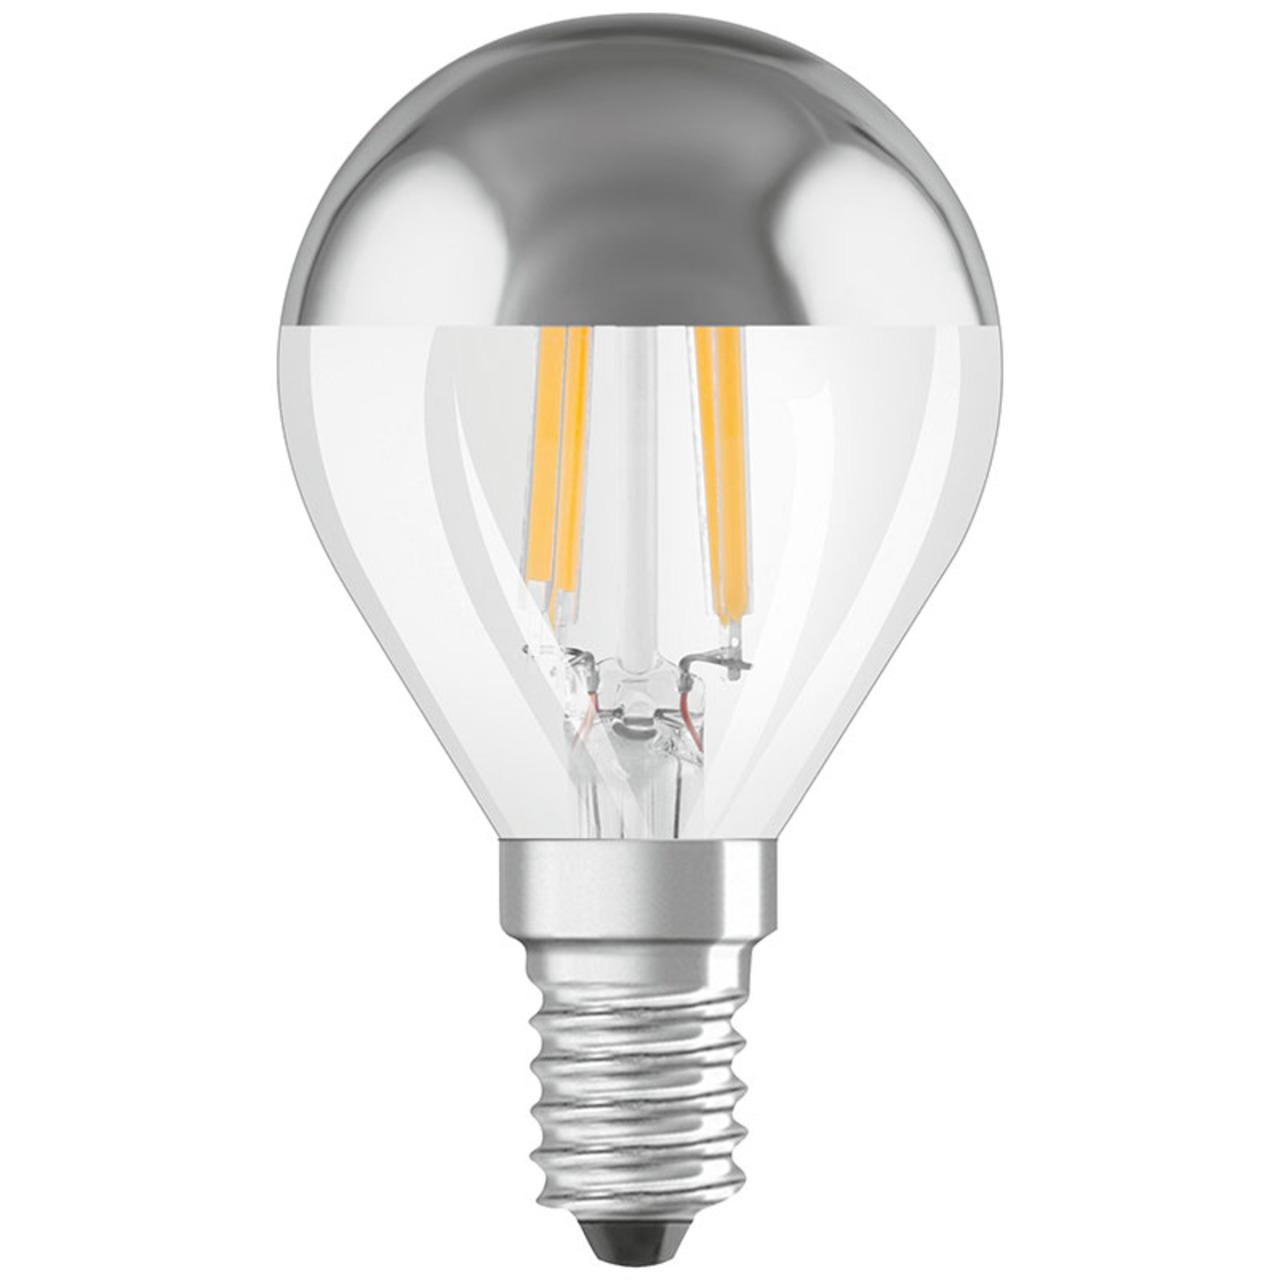 OSRAM LED FILAMENT MIRROR 4-W-LED-Tropfenlampe E14 mit Spiegelkopf- warmweiss